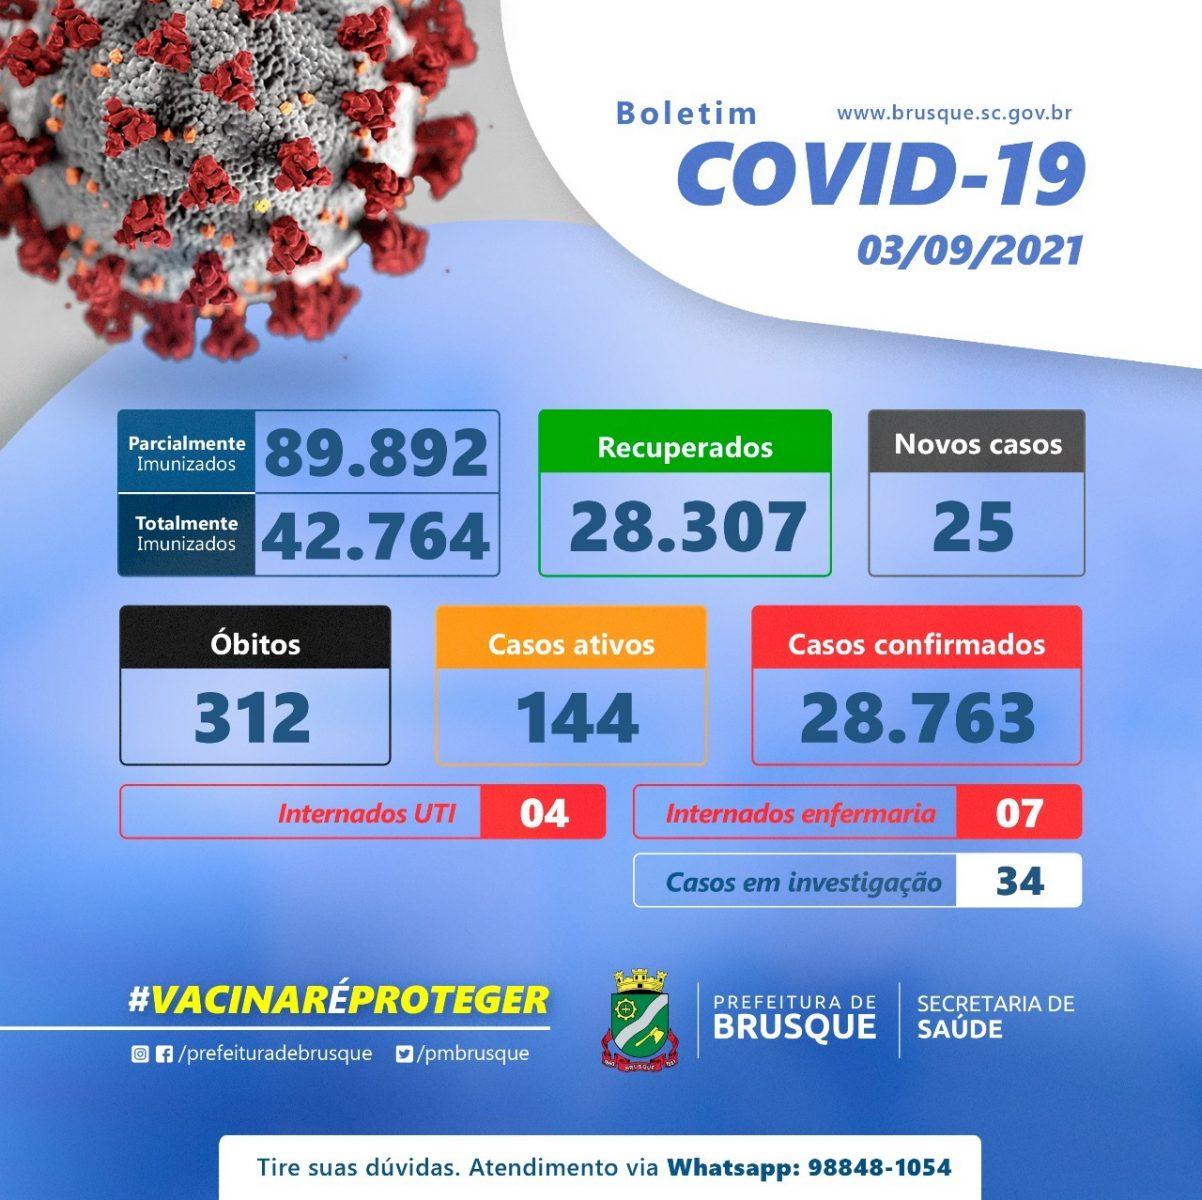 Covid-19: Confira o boletim epidemiológico desta sexta-feira (03)